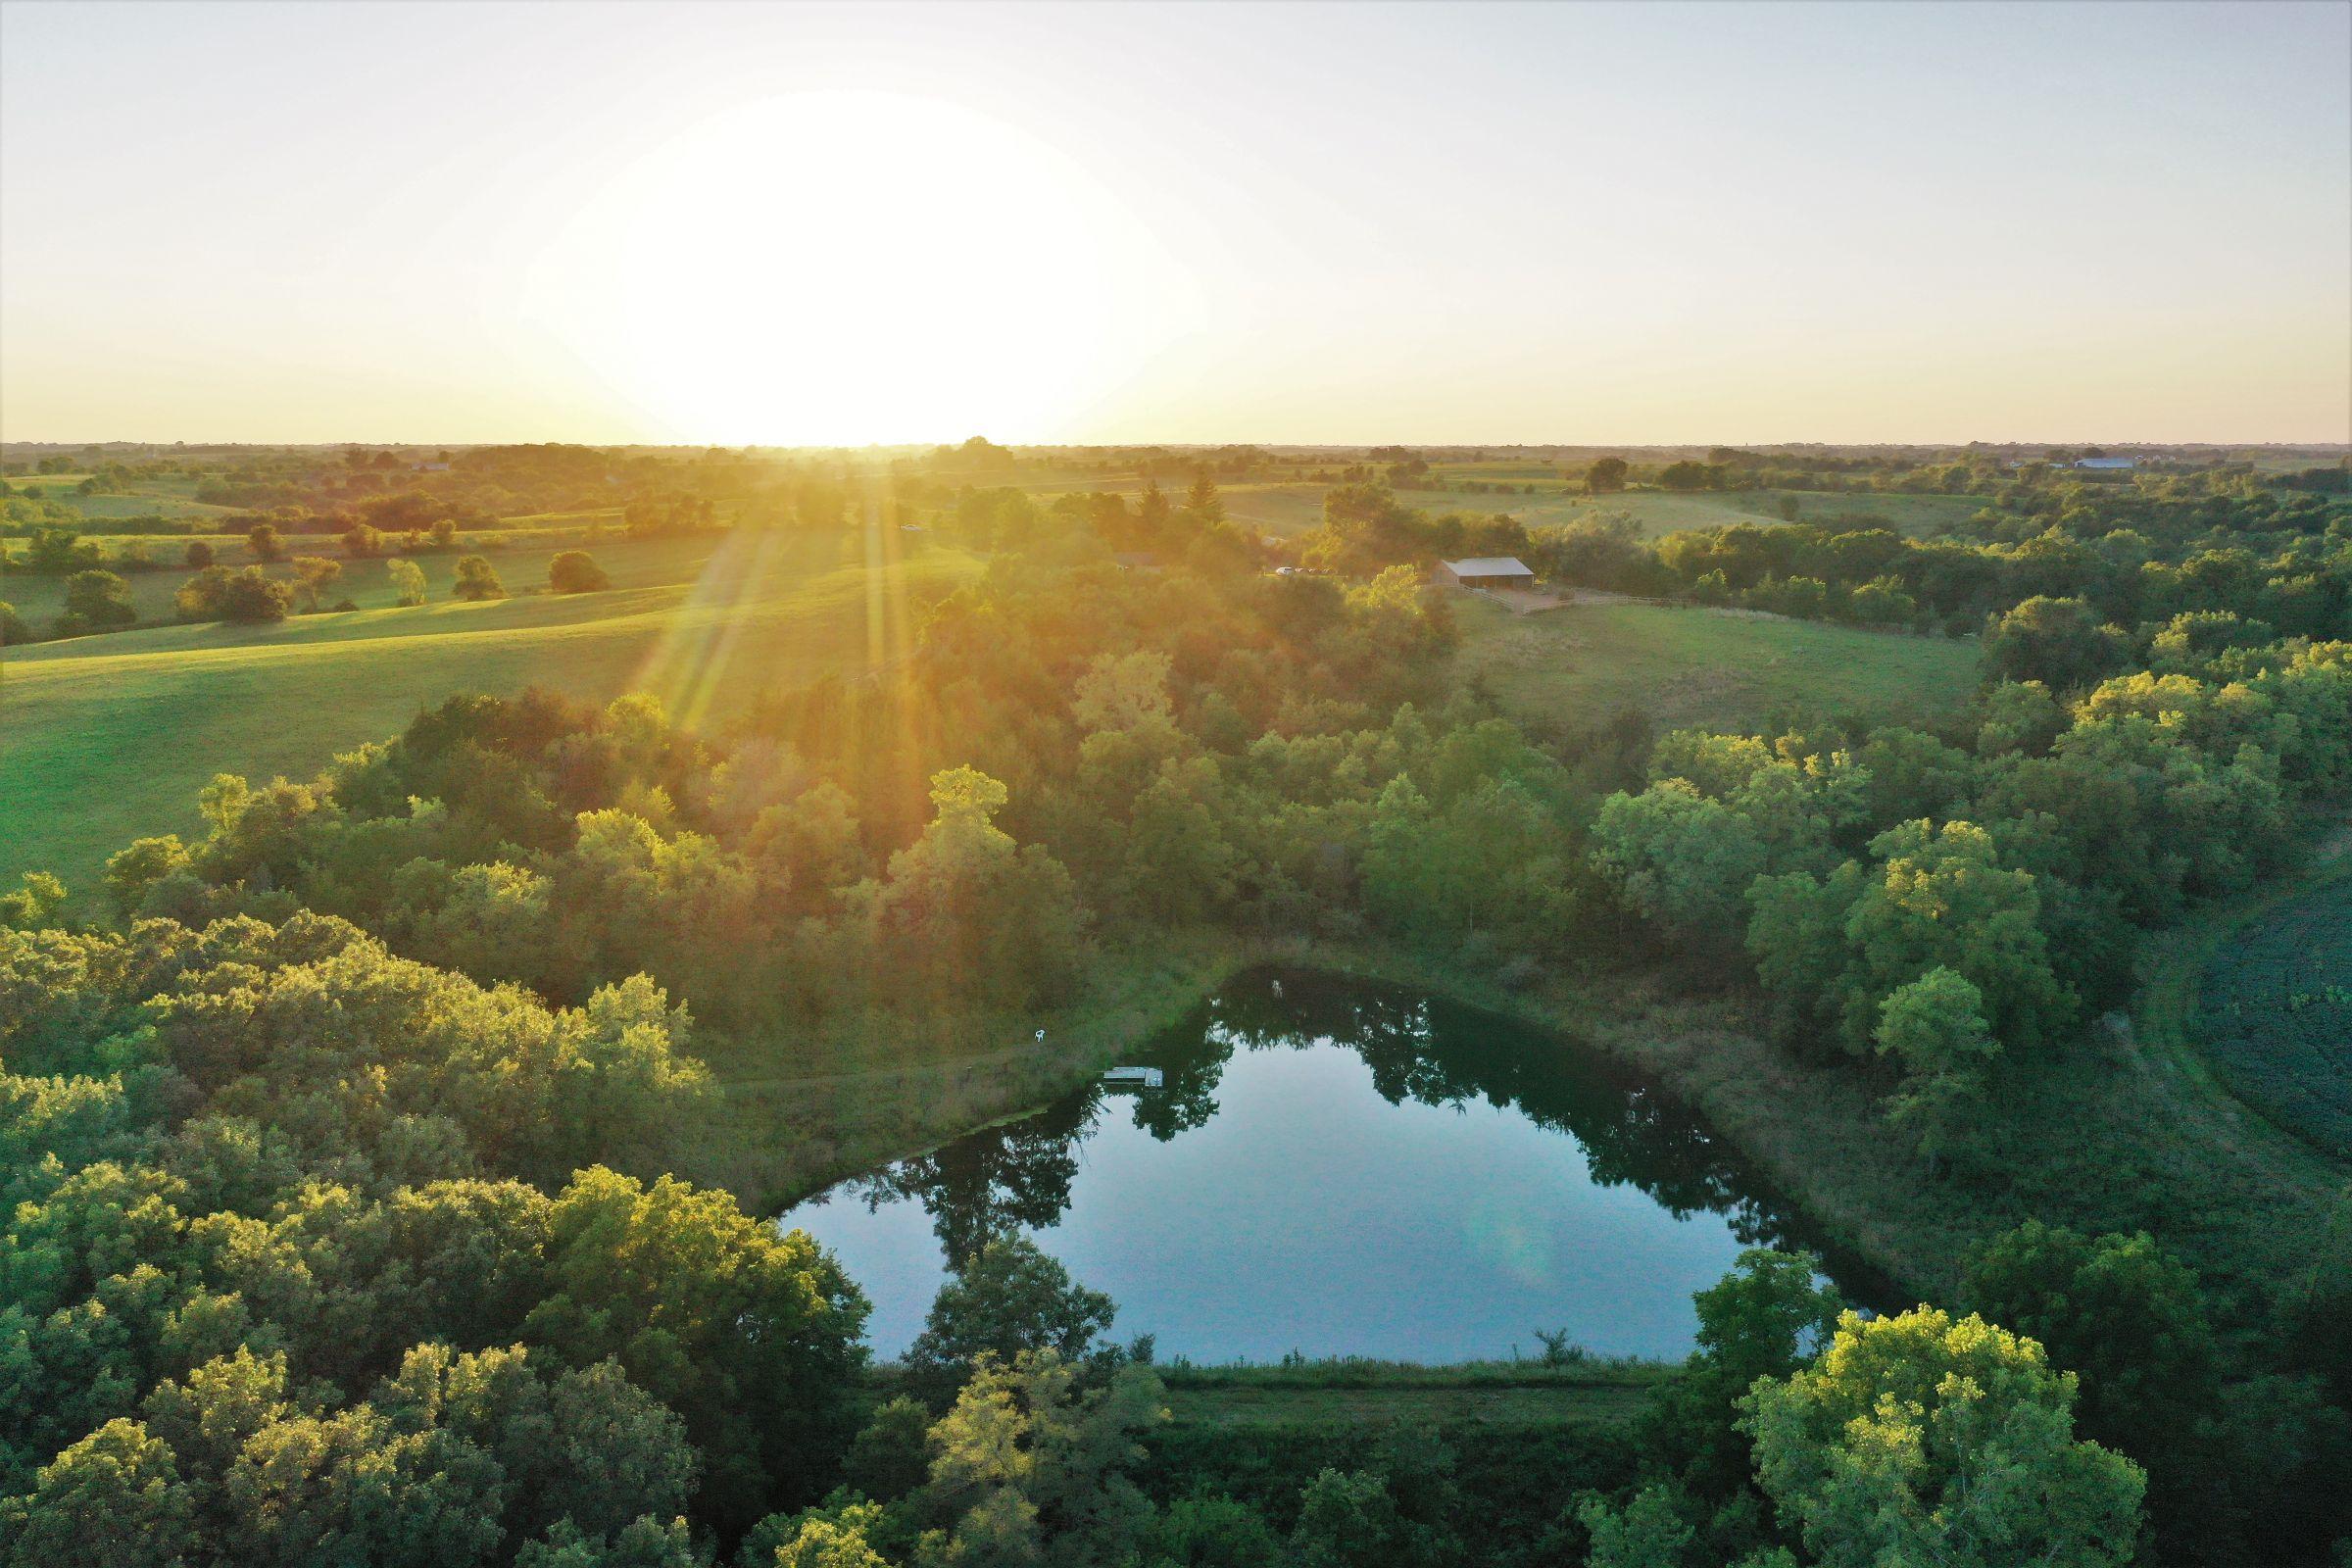 land-clarke-county-iowa-325-acres-listing-number-15416-0-2021-03-18-163309.JPG